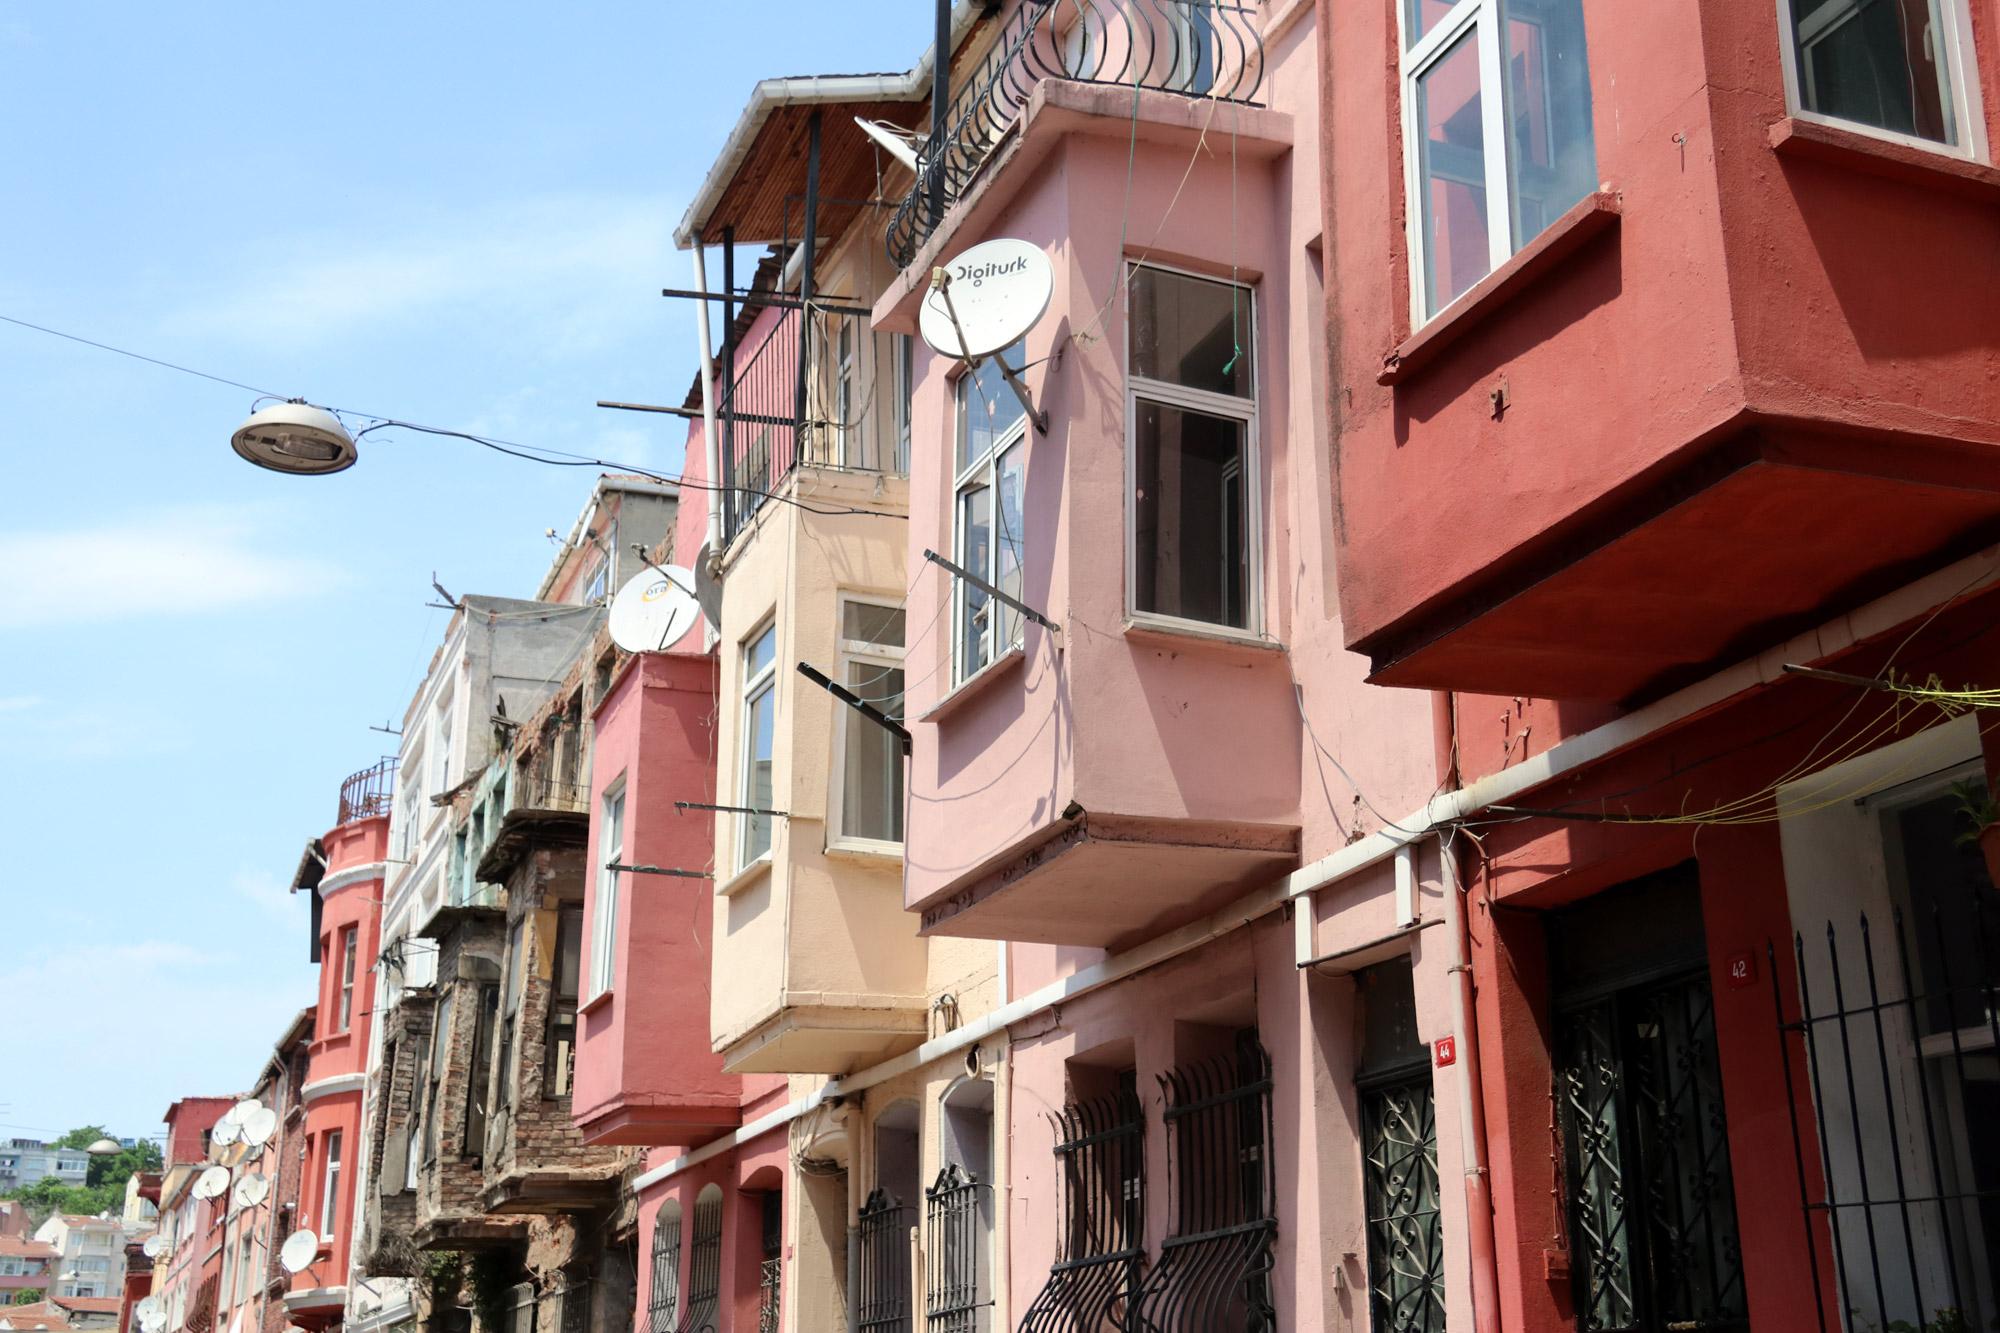 Stedentrip Istanbul - Karakteristieke huisjes in Balat